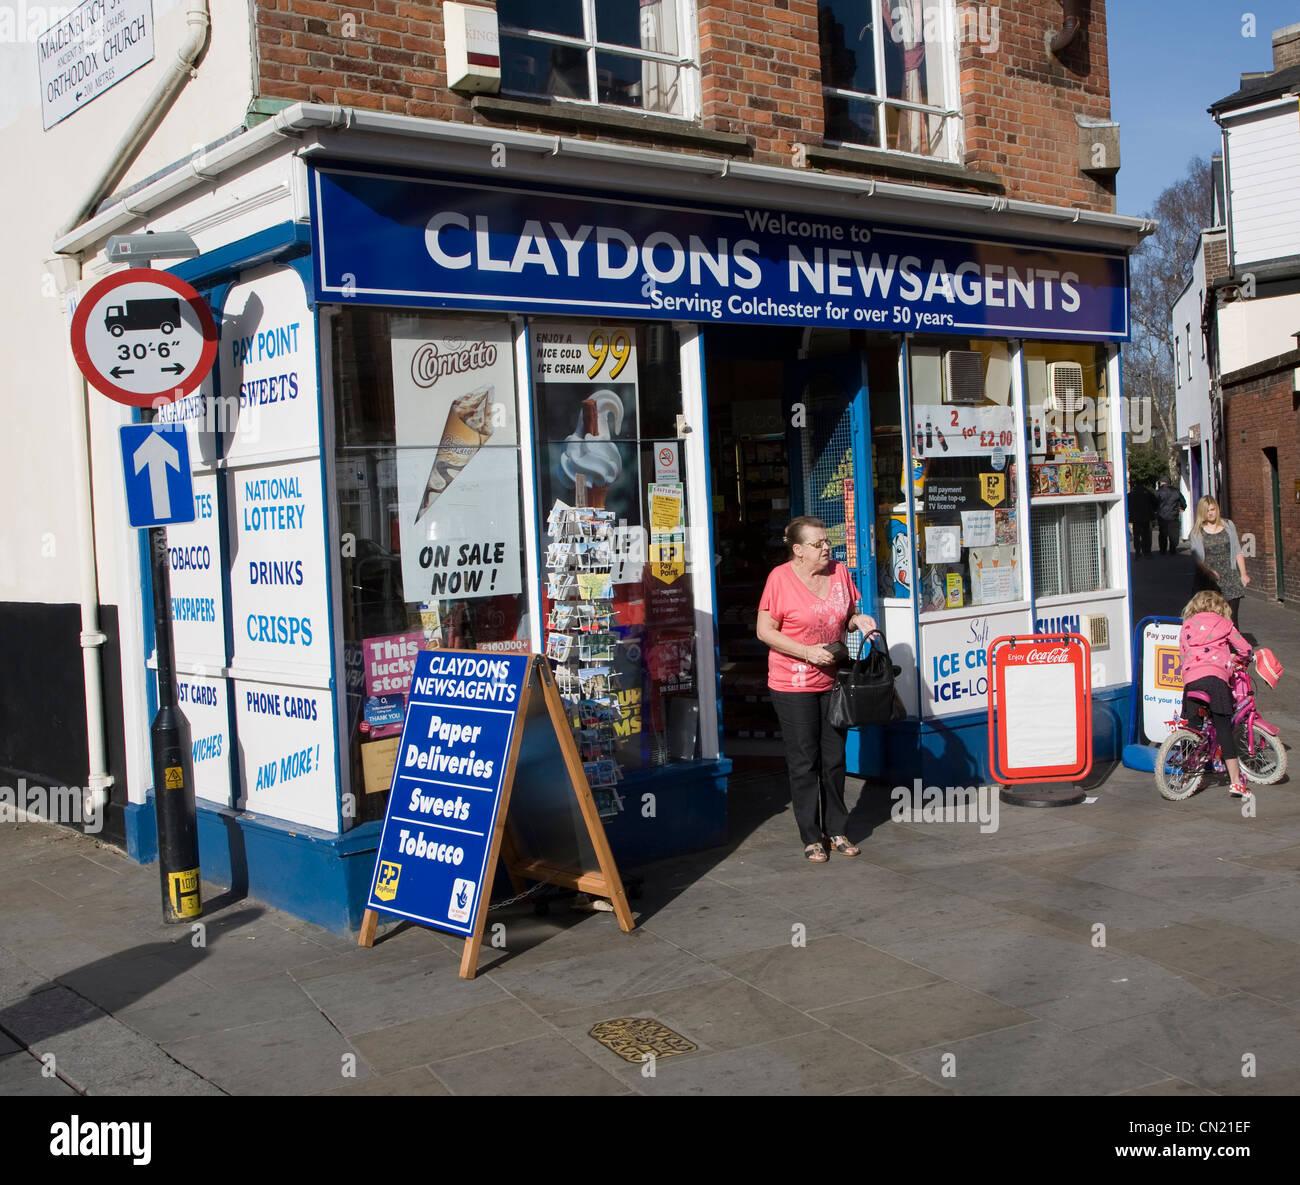 Claydons newsagents Colchester Essex England Stock Photo